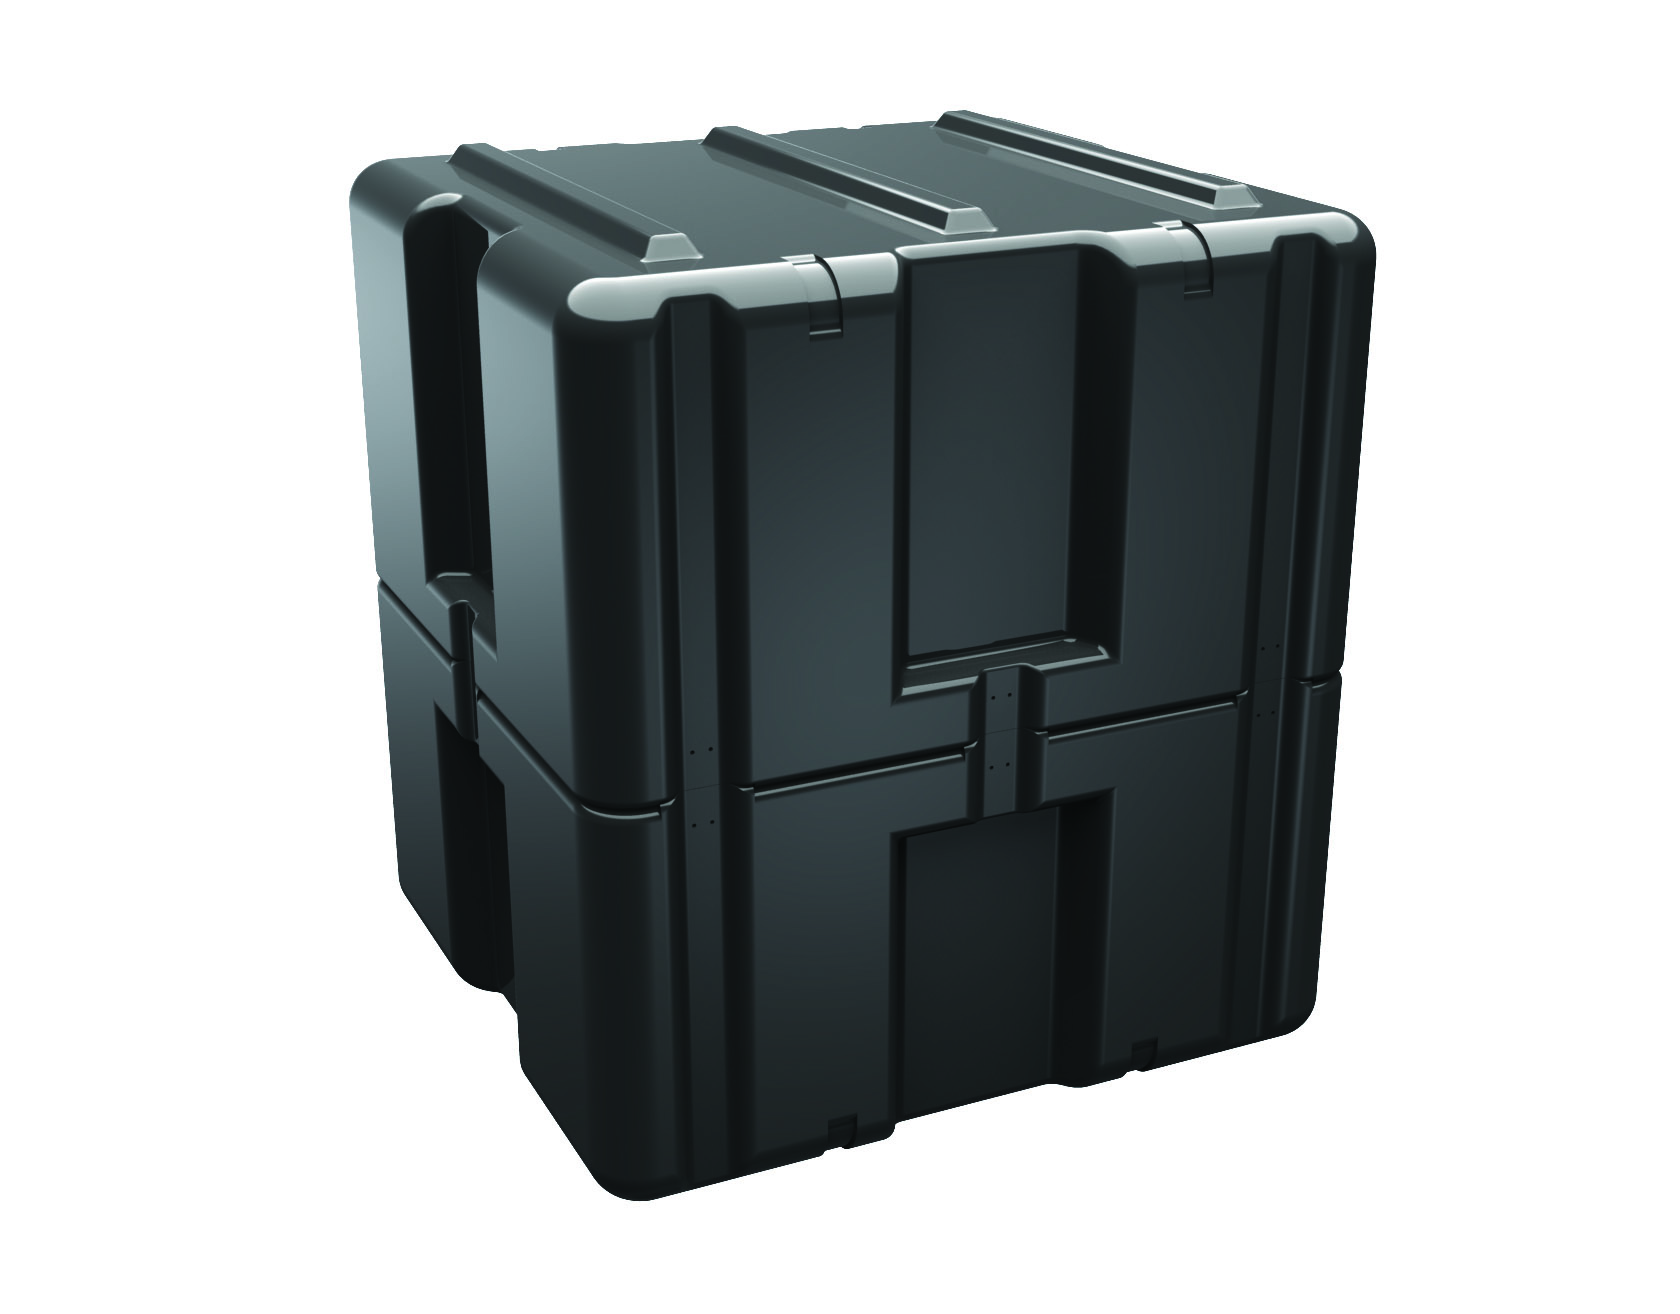 AL2221-1214 - AL2221-1214 Military Storage Container Single Lid